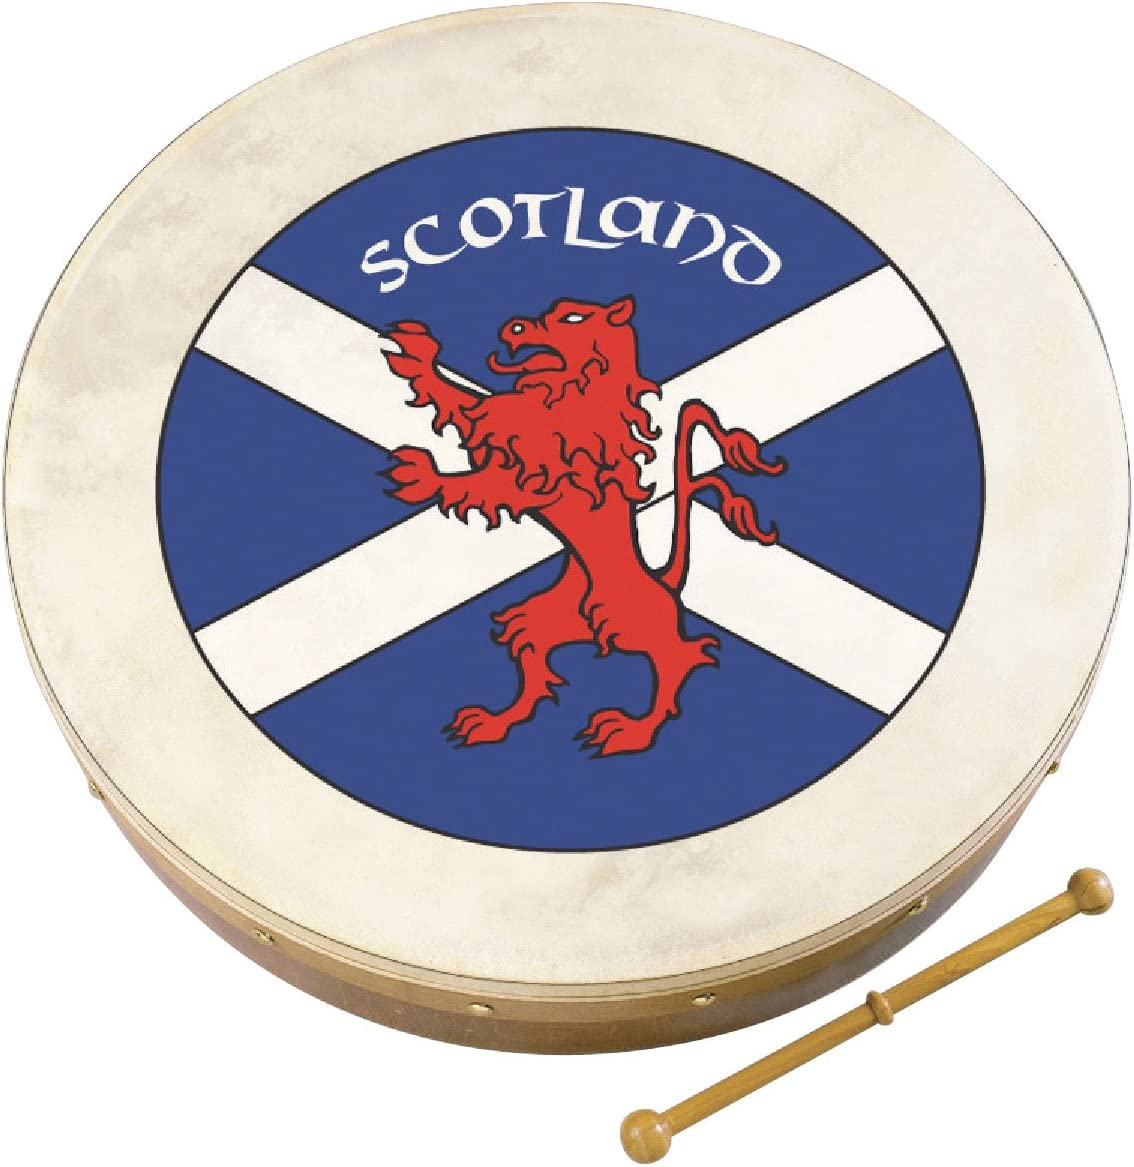 10AWAL-2368 Waltons 12 Scottish Flag Saltaire Crest Tuned Bodhran